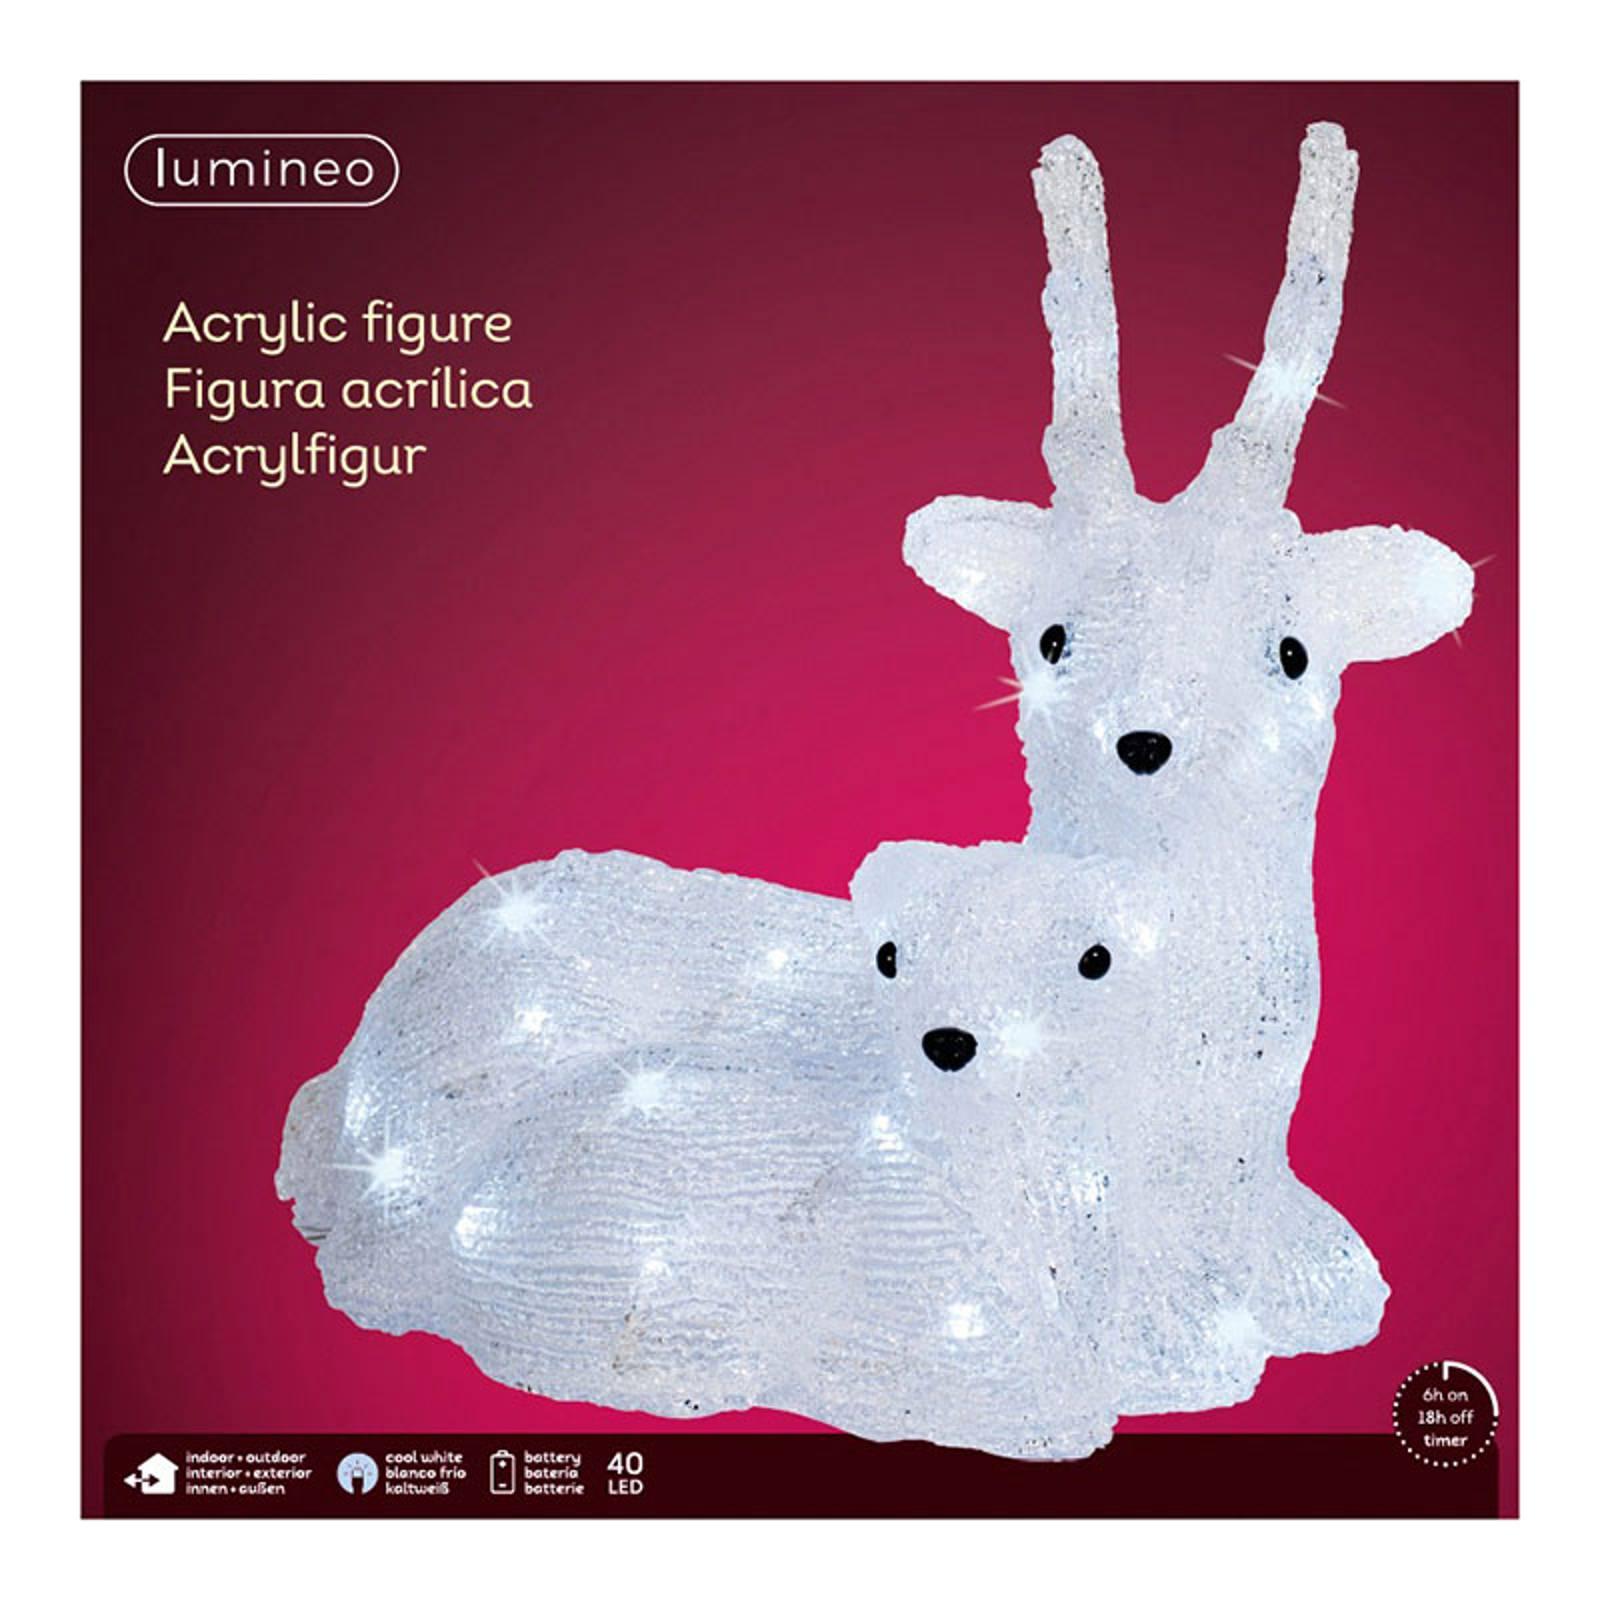 "*Merry X-Mas*: LED-Leuchtfigur ""Ricke mit Kitz"" aus Acryl (Kopie) Lampenwelt"